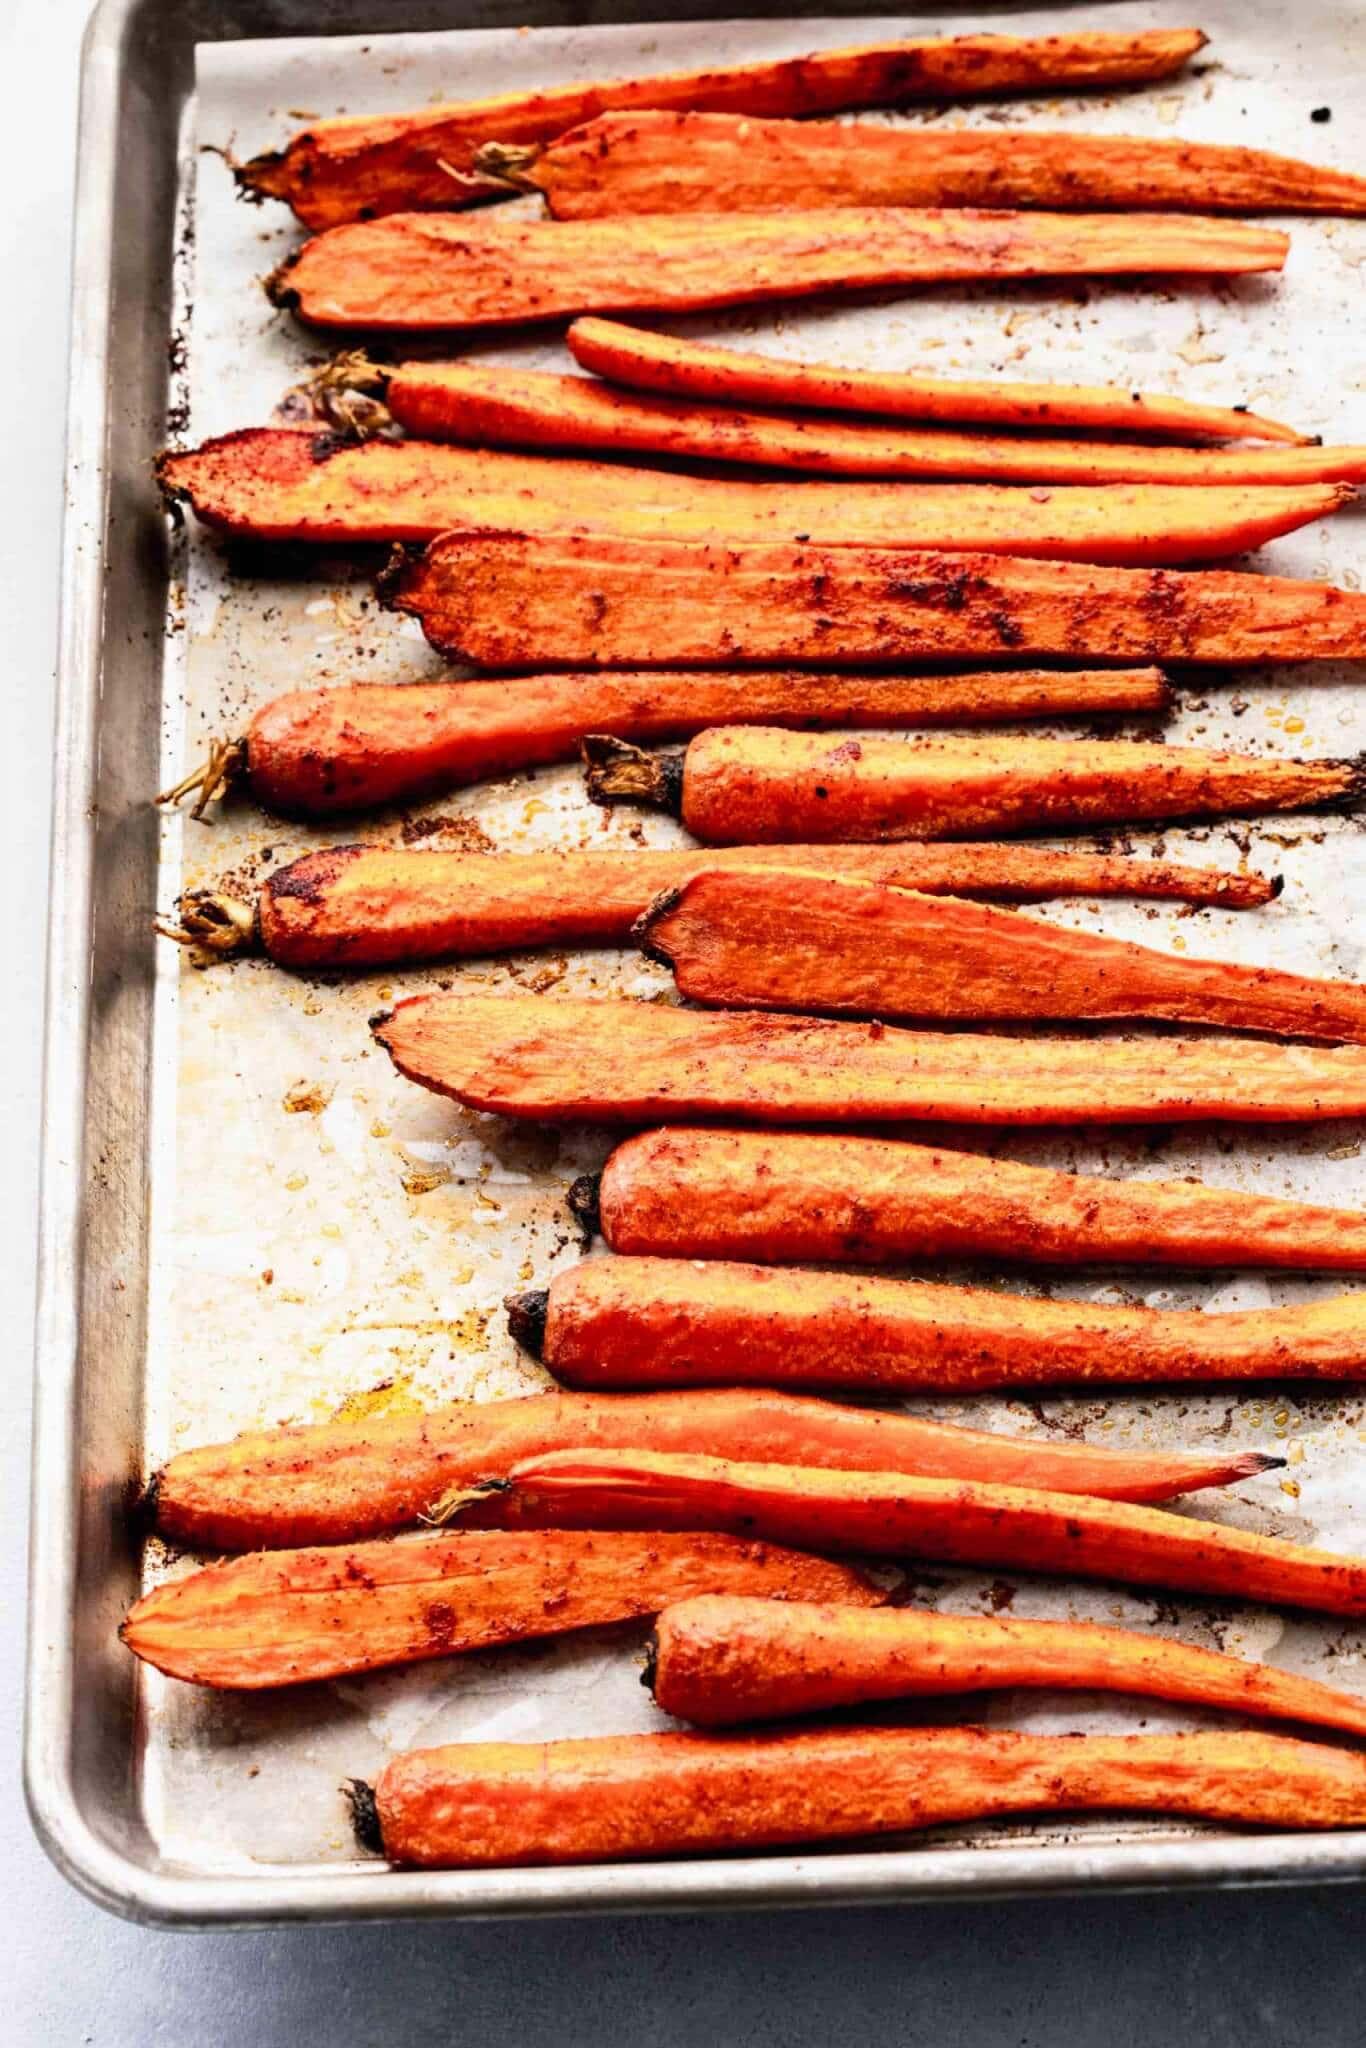 Oven roasted carrots on baking sheet.